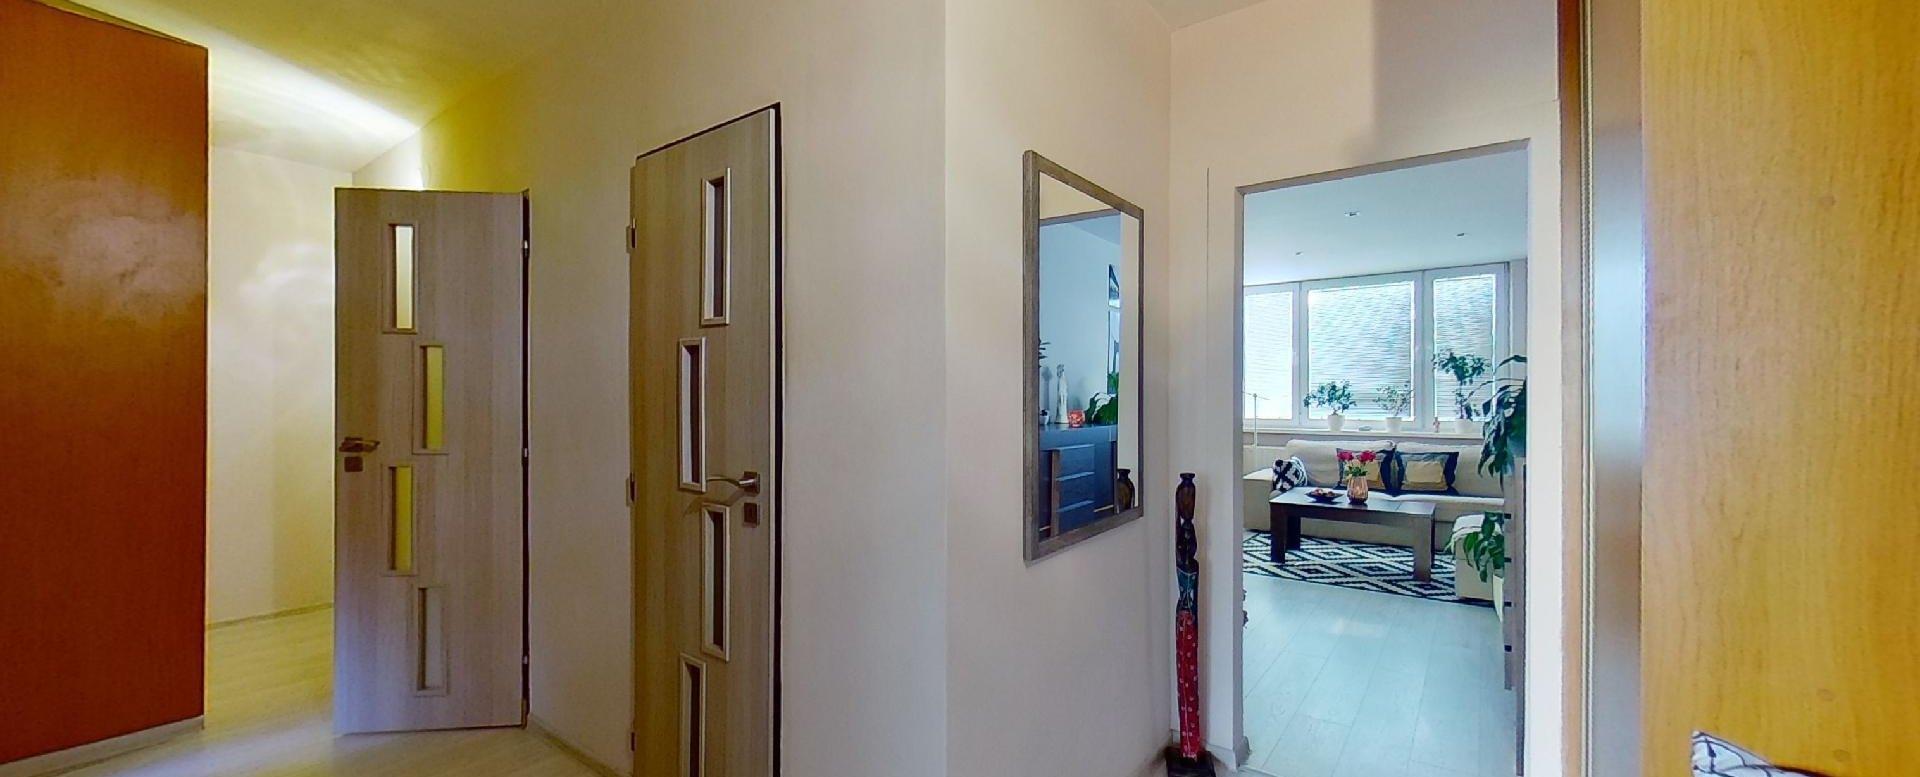 phľad v hale